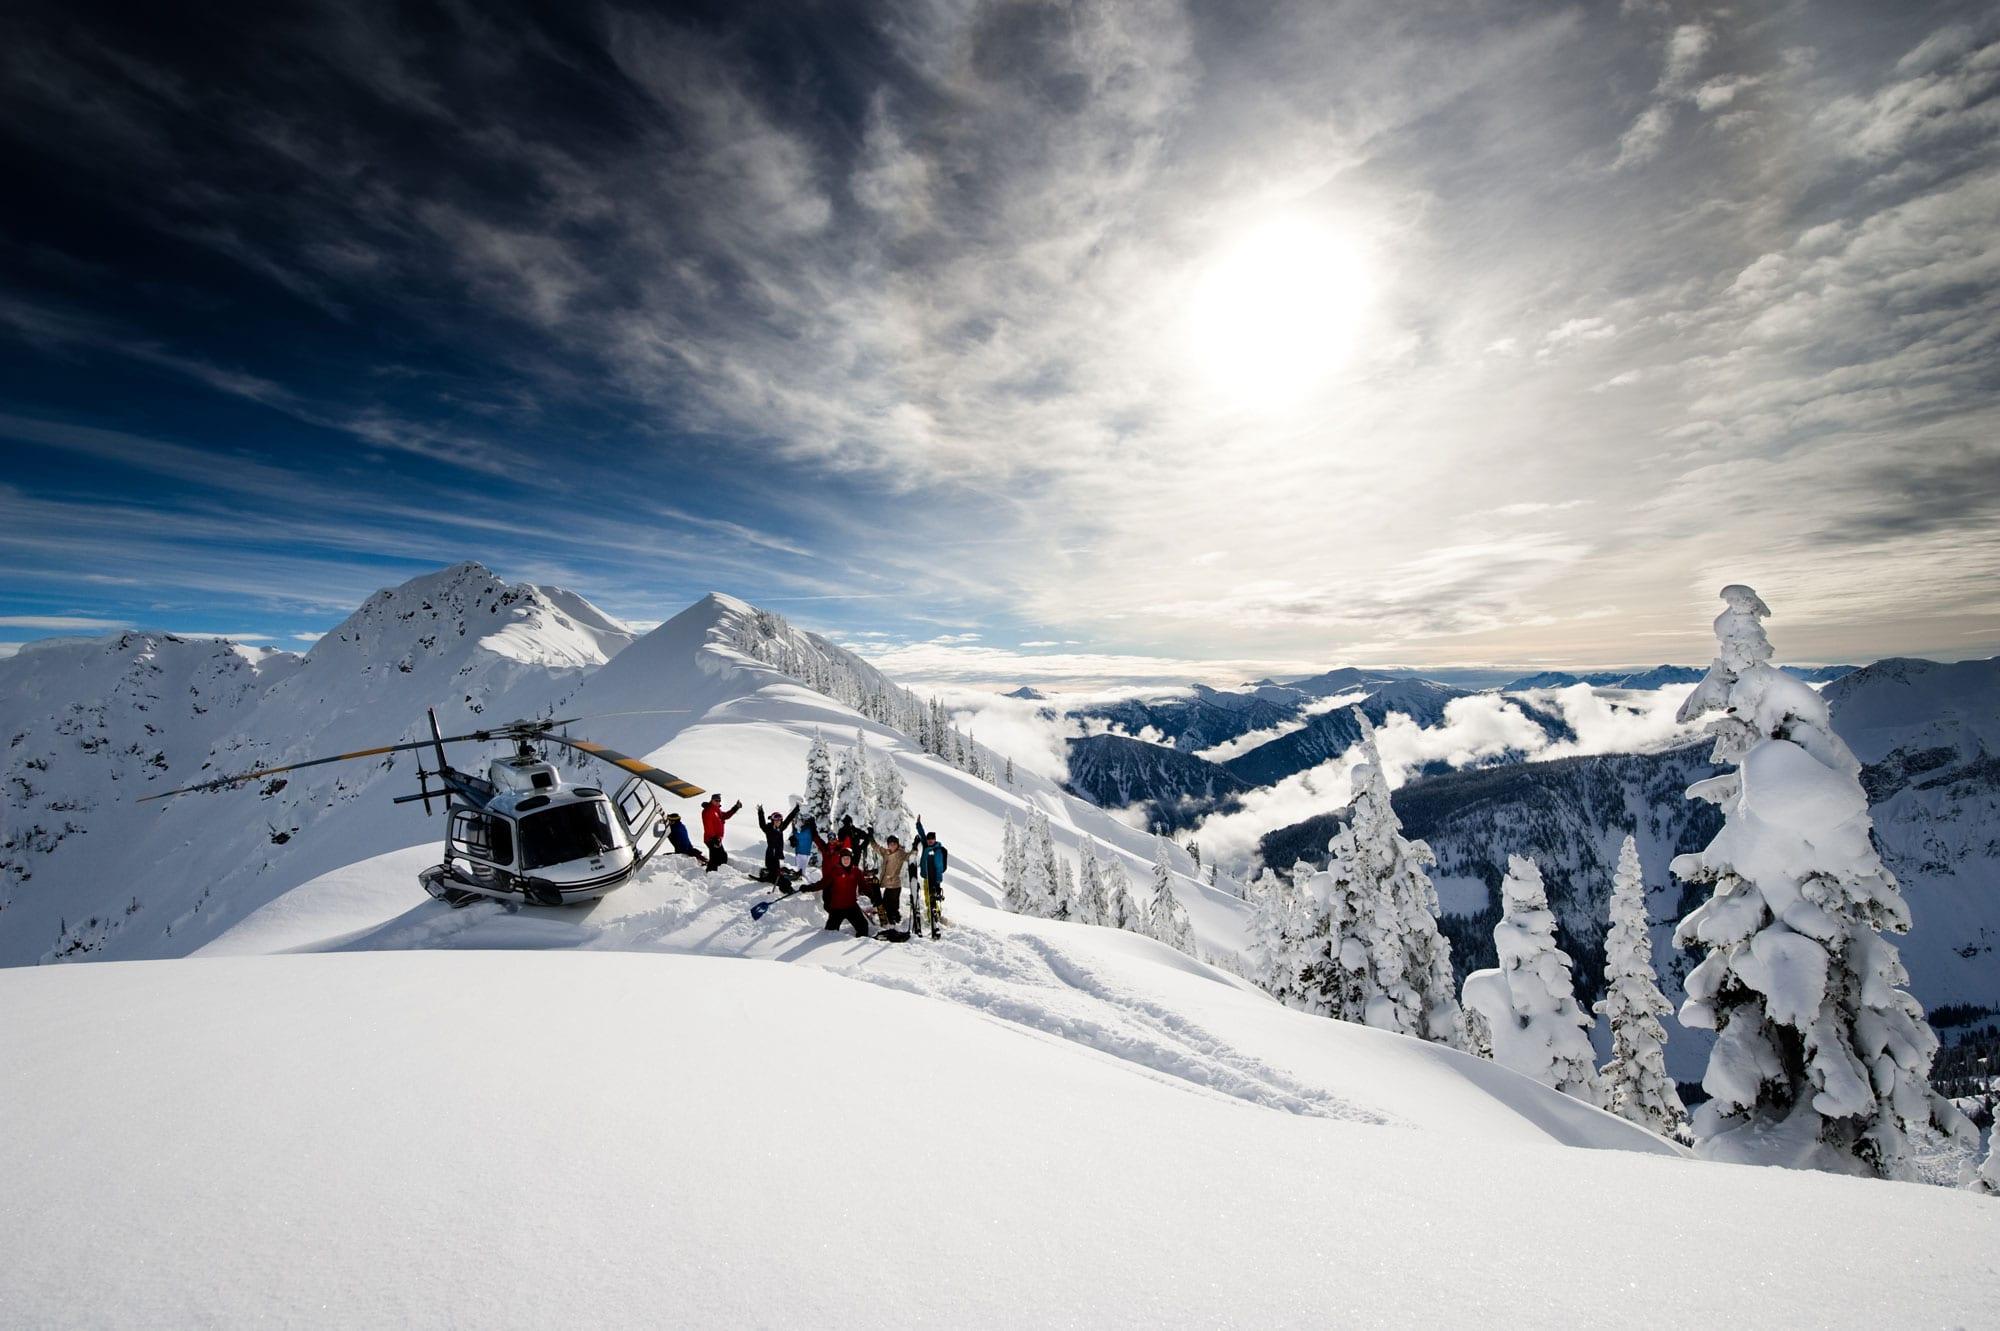 revelstoke-heli-skiing-winter